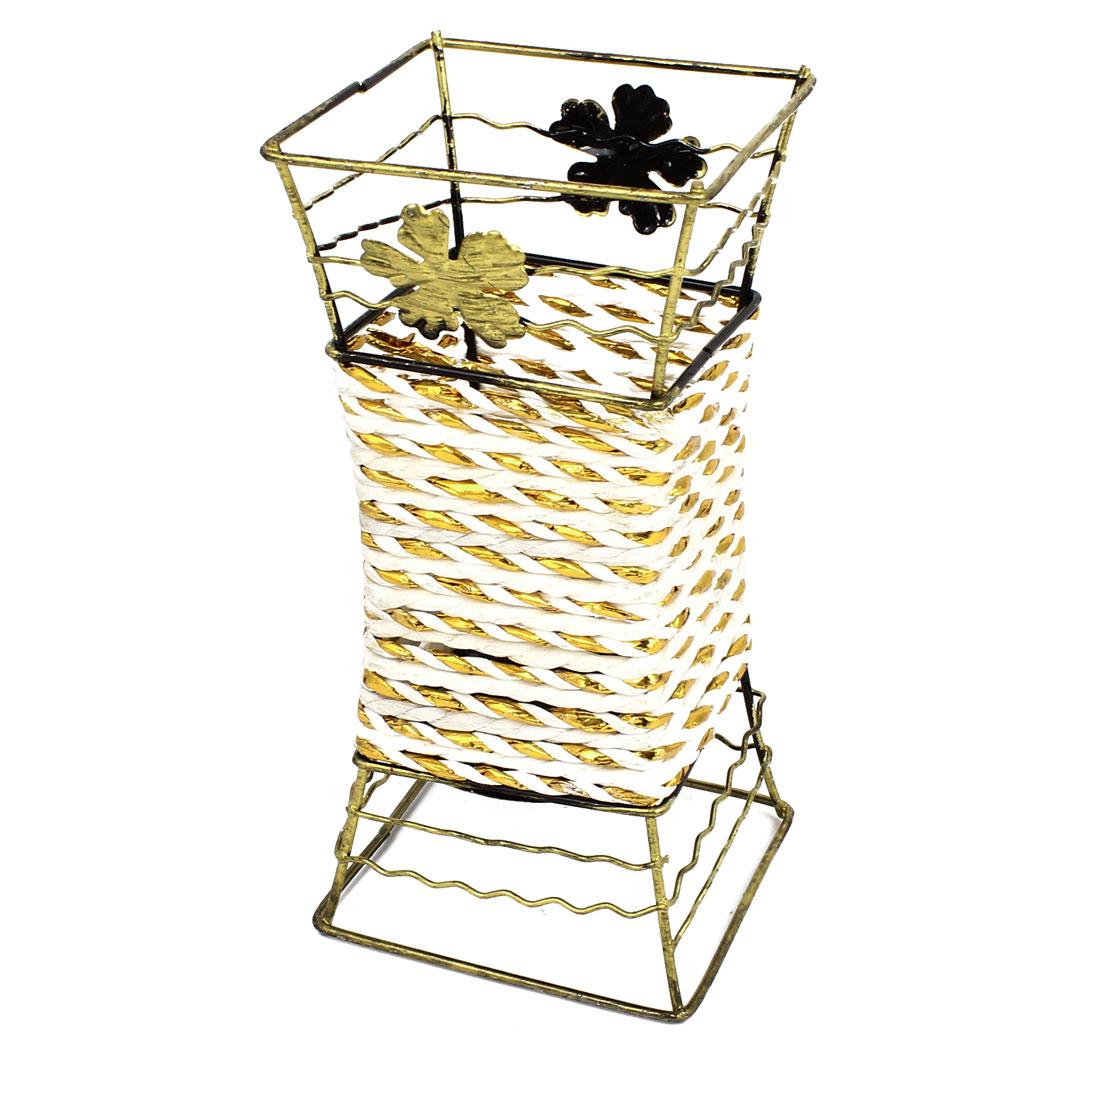 Bronze Tone Metal Frame White Woven Artificial Flowers Basket Desktop Decor